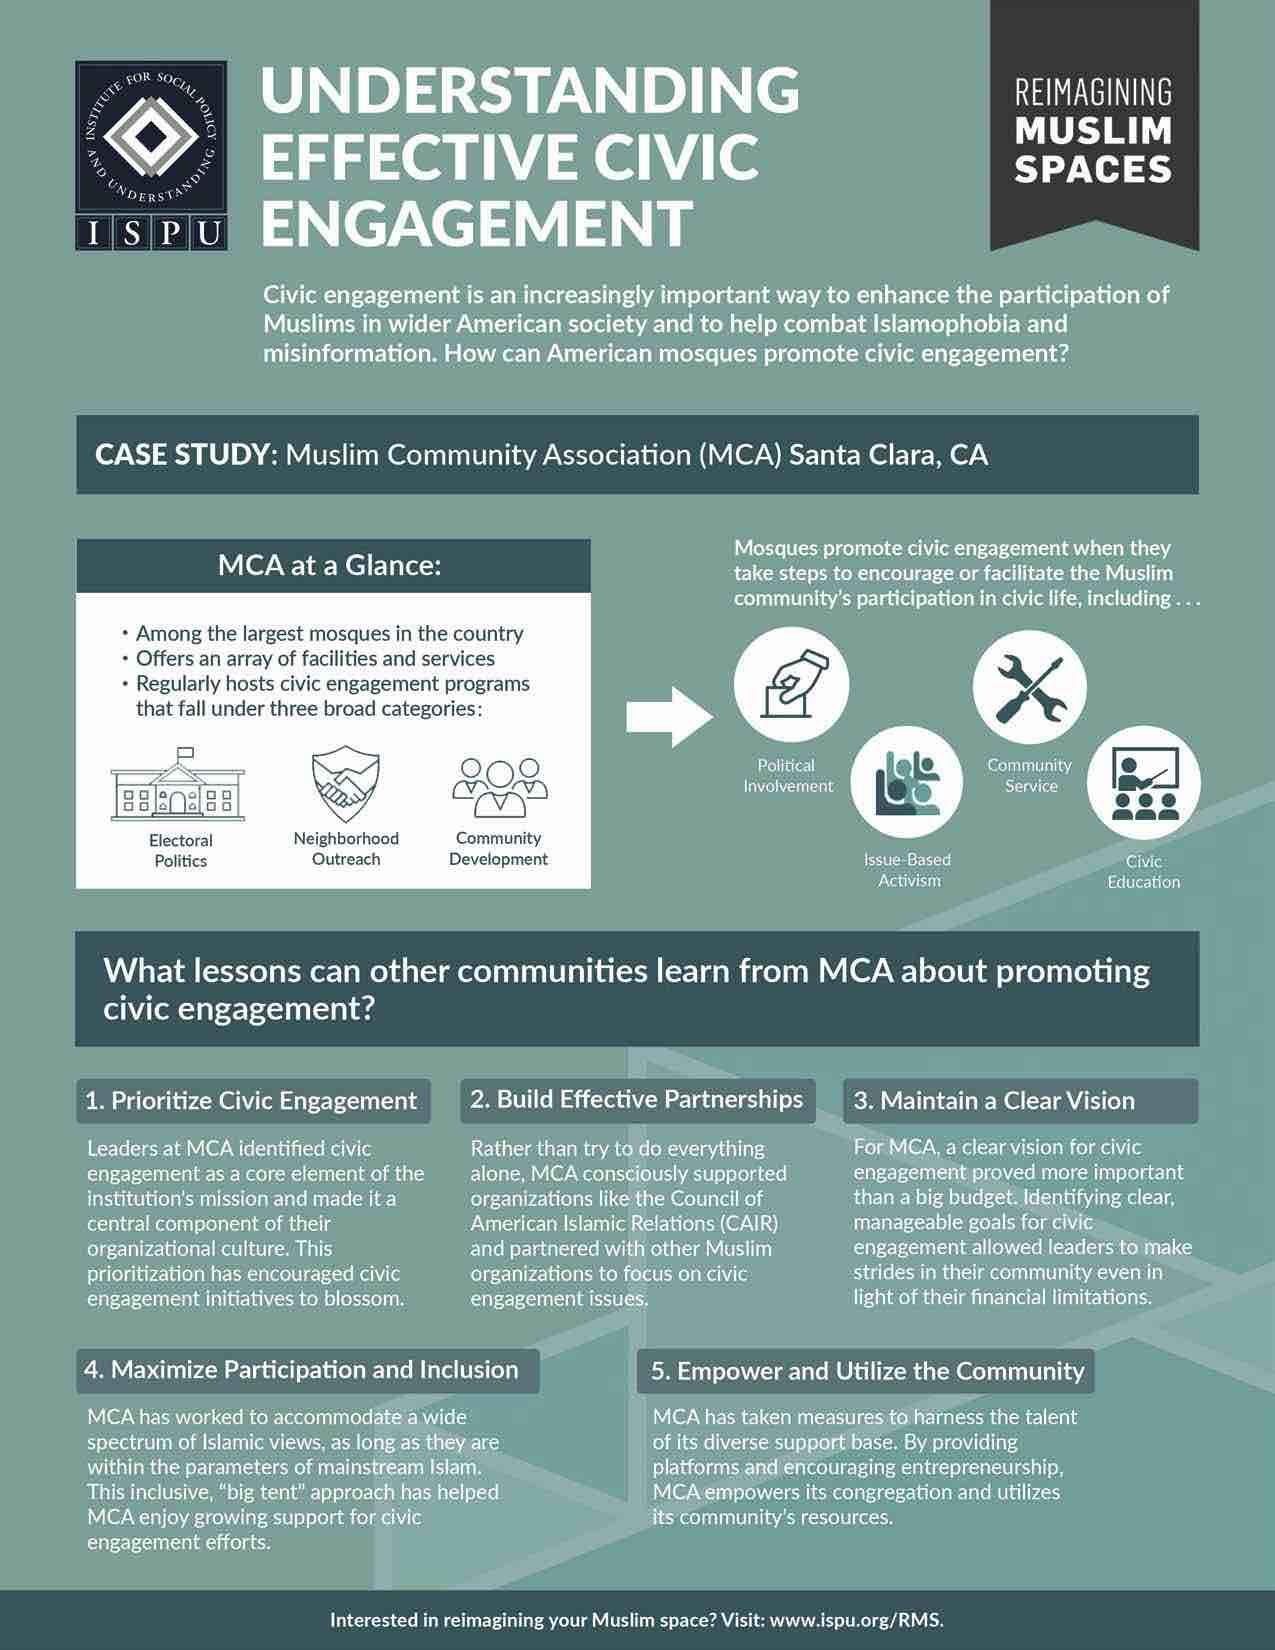 Understanding Effective Civic Engagement Infographic